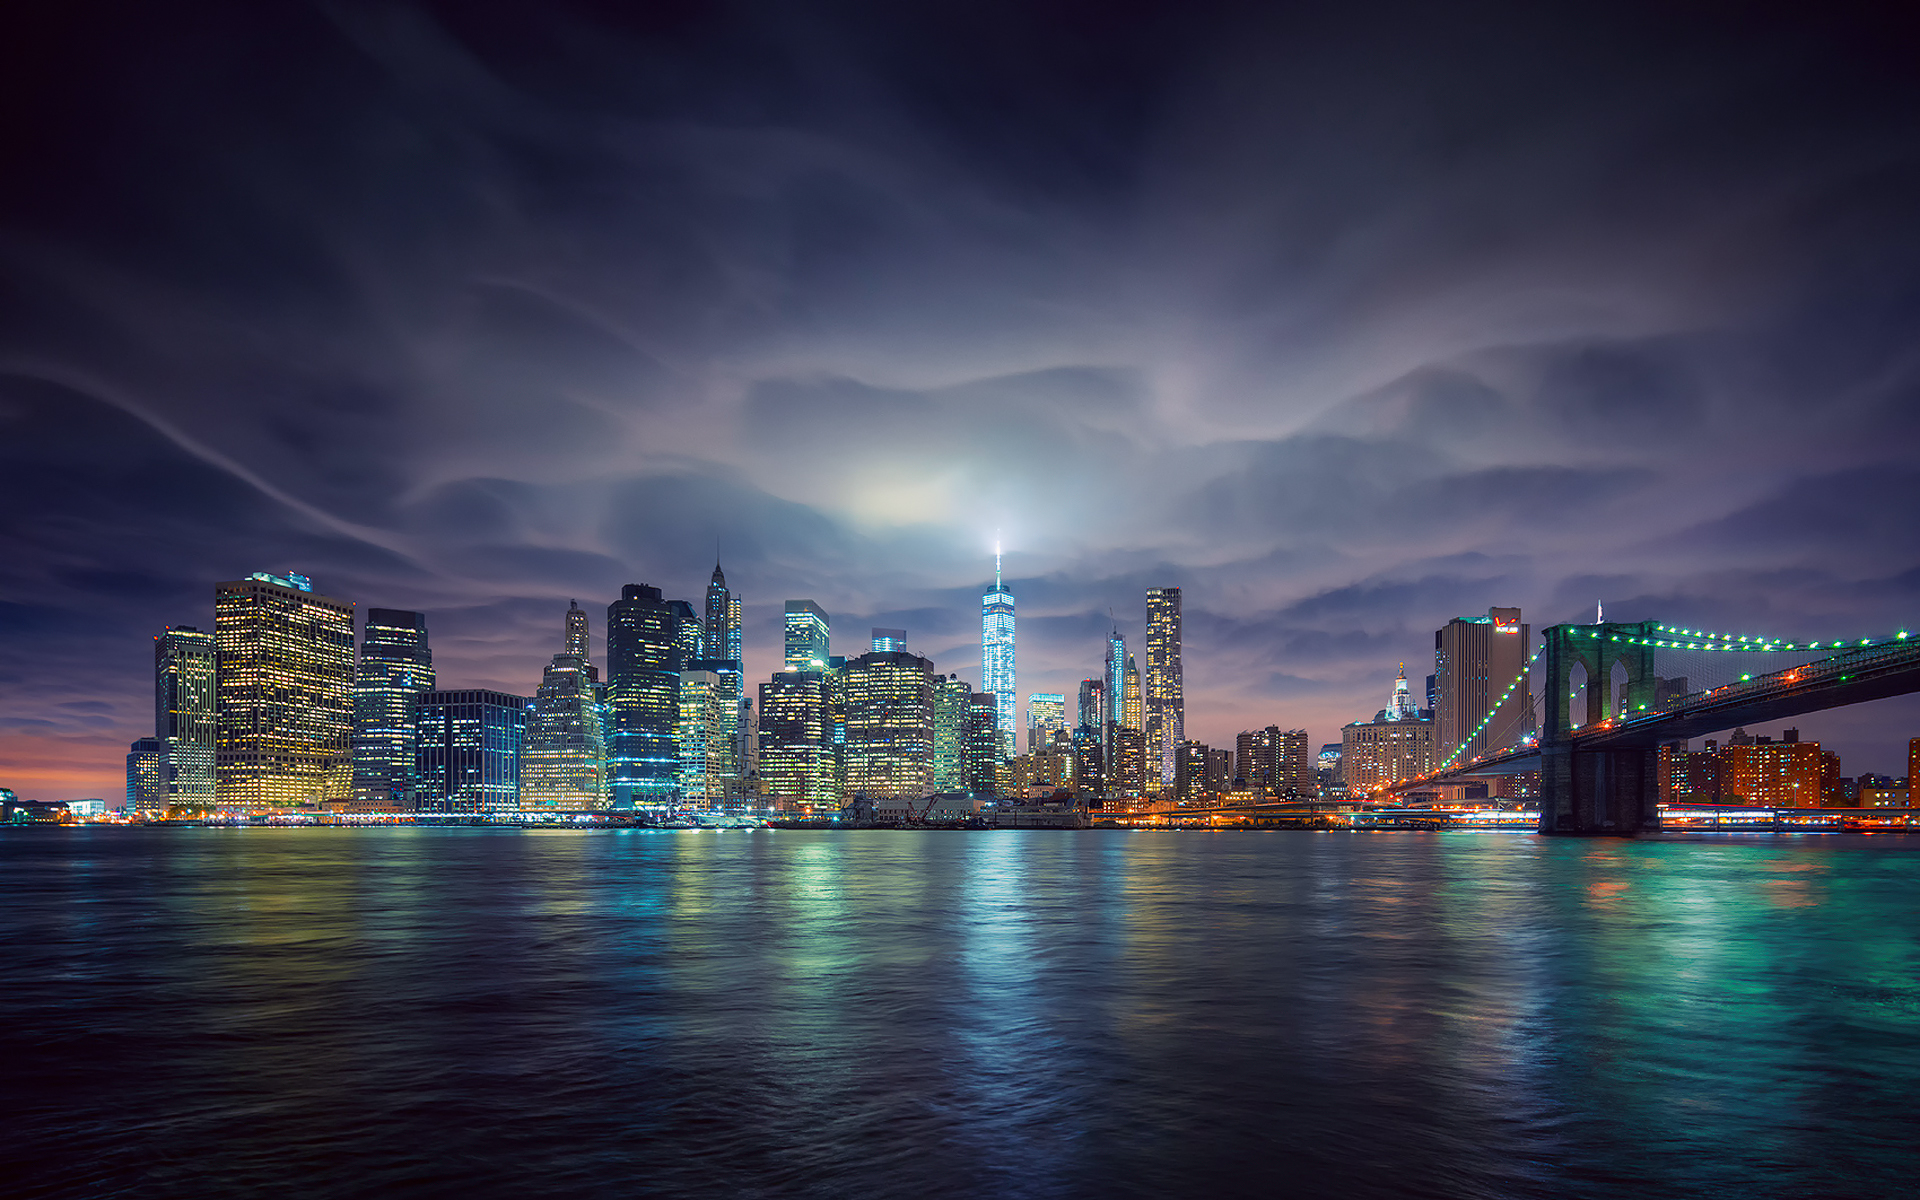 New york city skyline at night hd wallpaper background image 1920x1200 id 695946 - Skyline night wallpaper ...